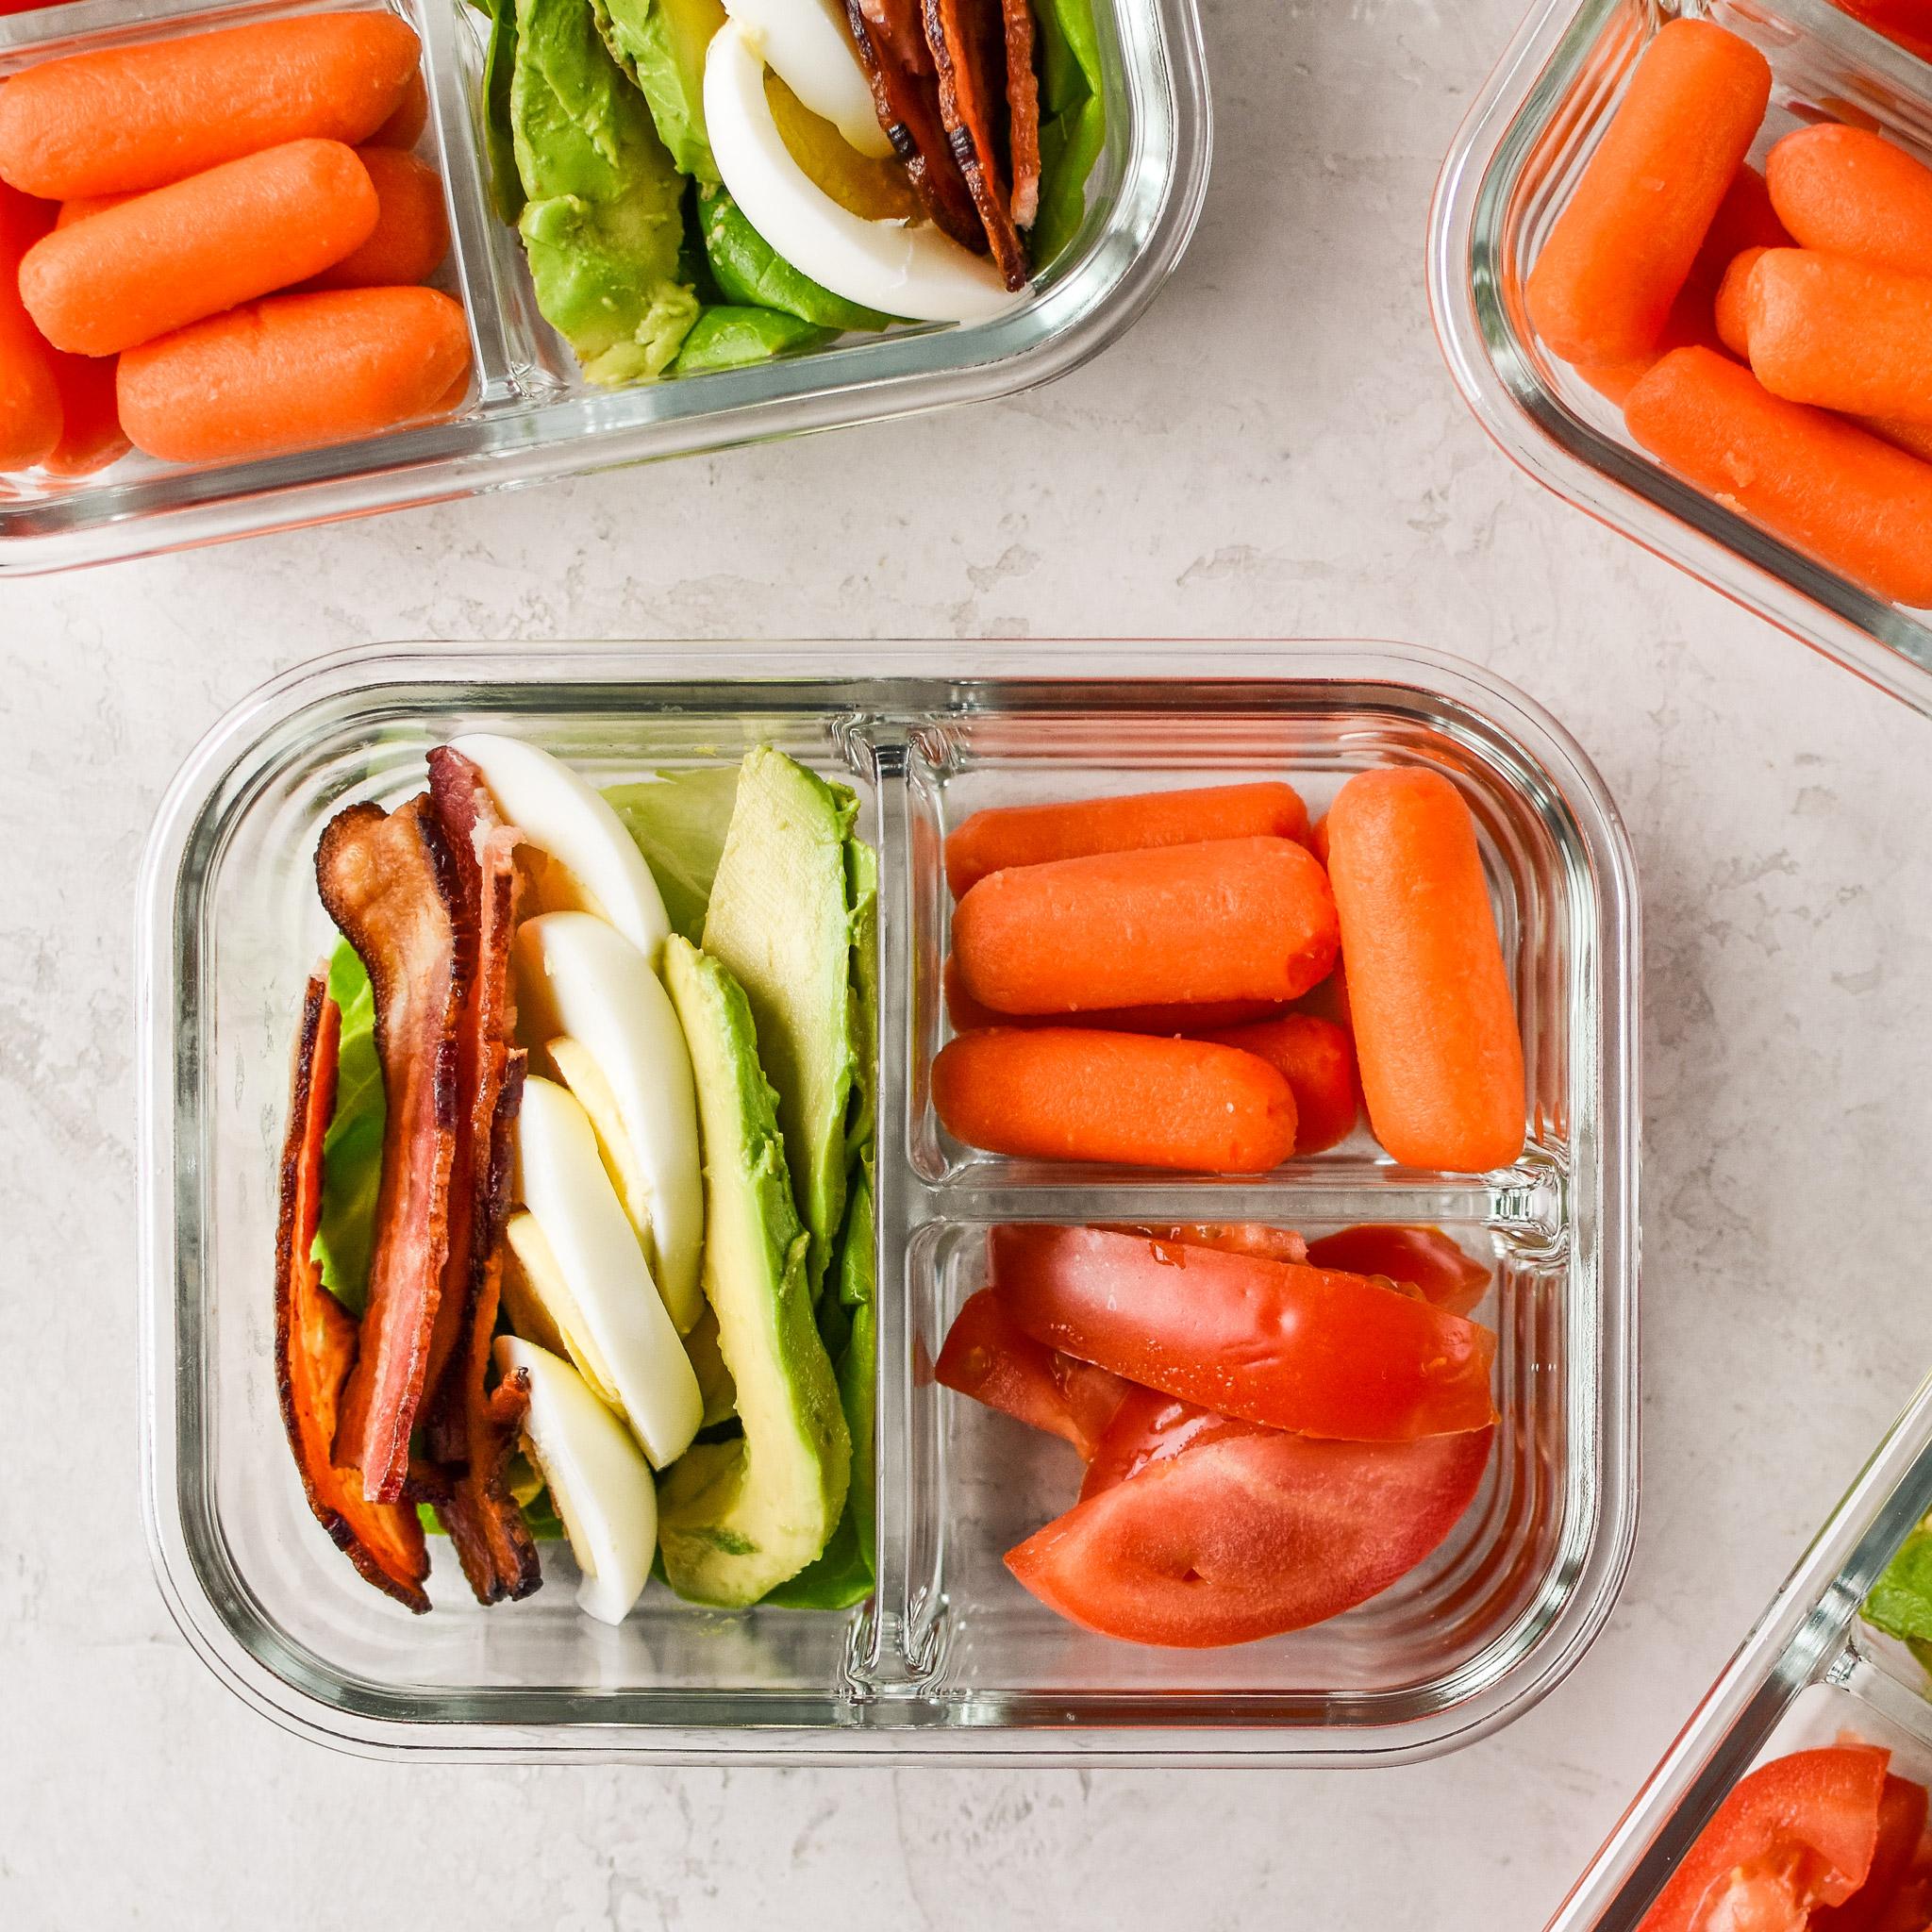 BLTA Lettuce Wraps Meal Prep